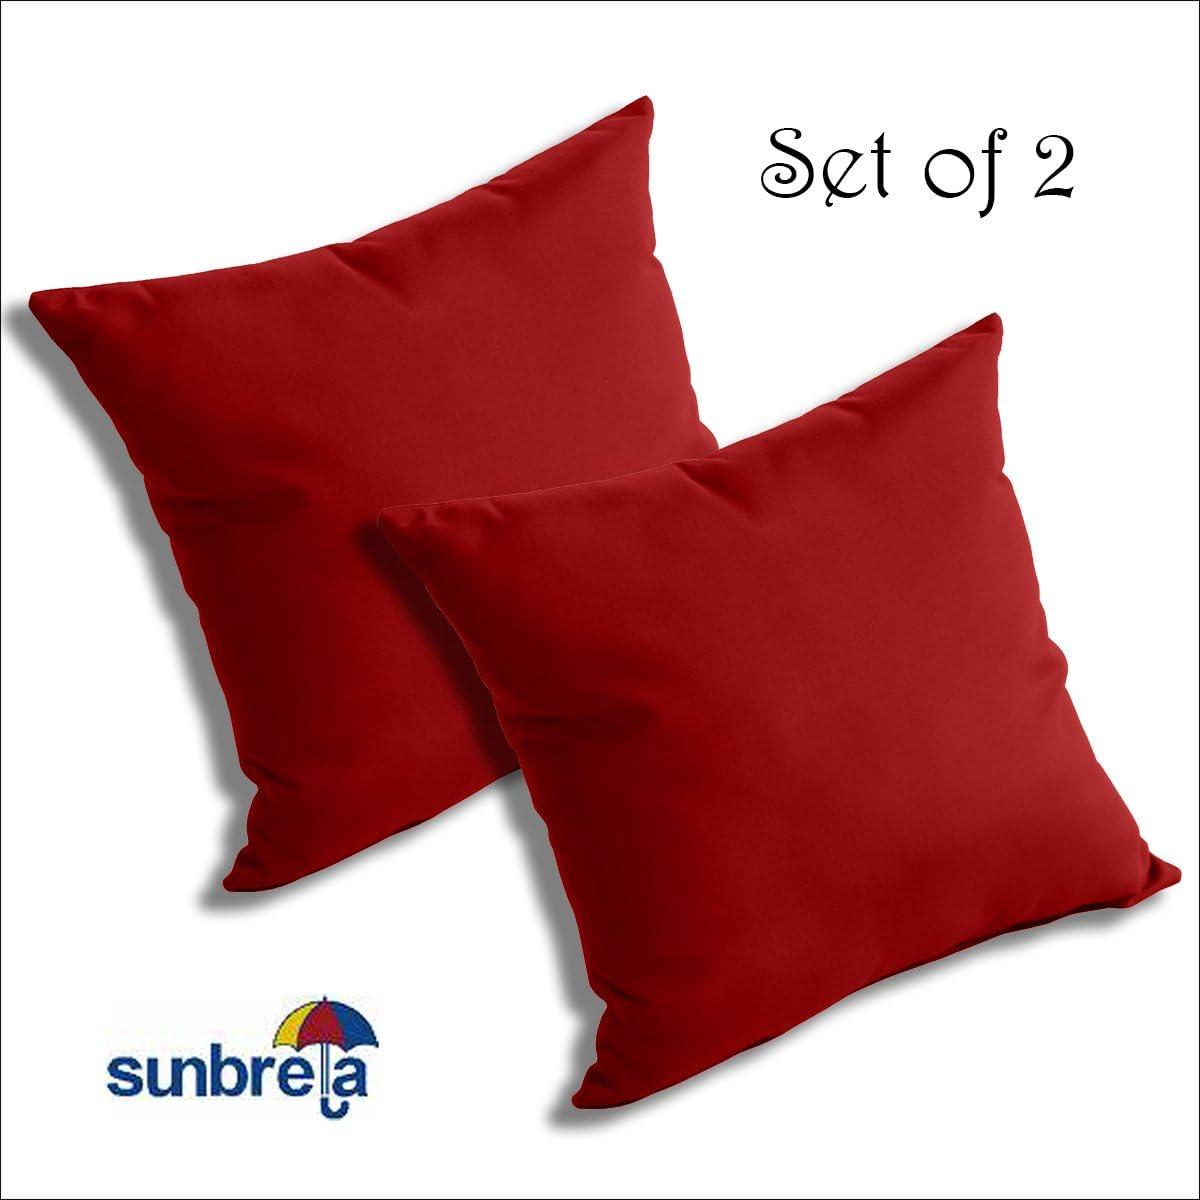 SET OF 2 Sunbrella Outdoor Indoor THROW PILLOWS by Comfort Classics Inc. JOCKEY RED